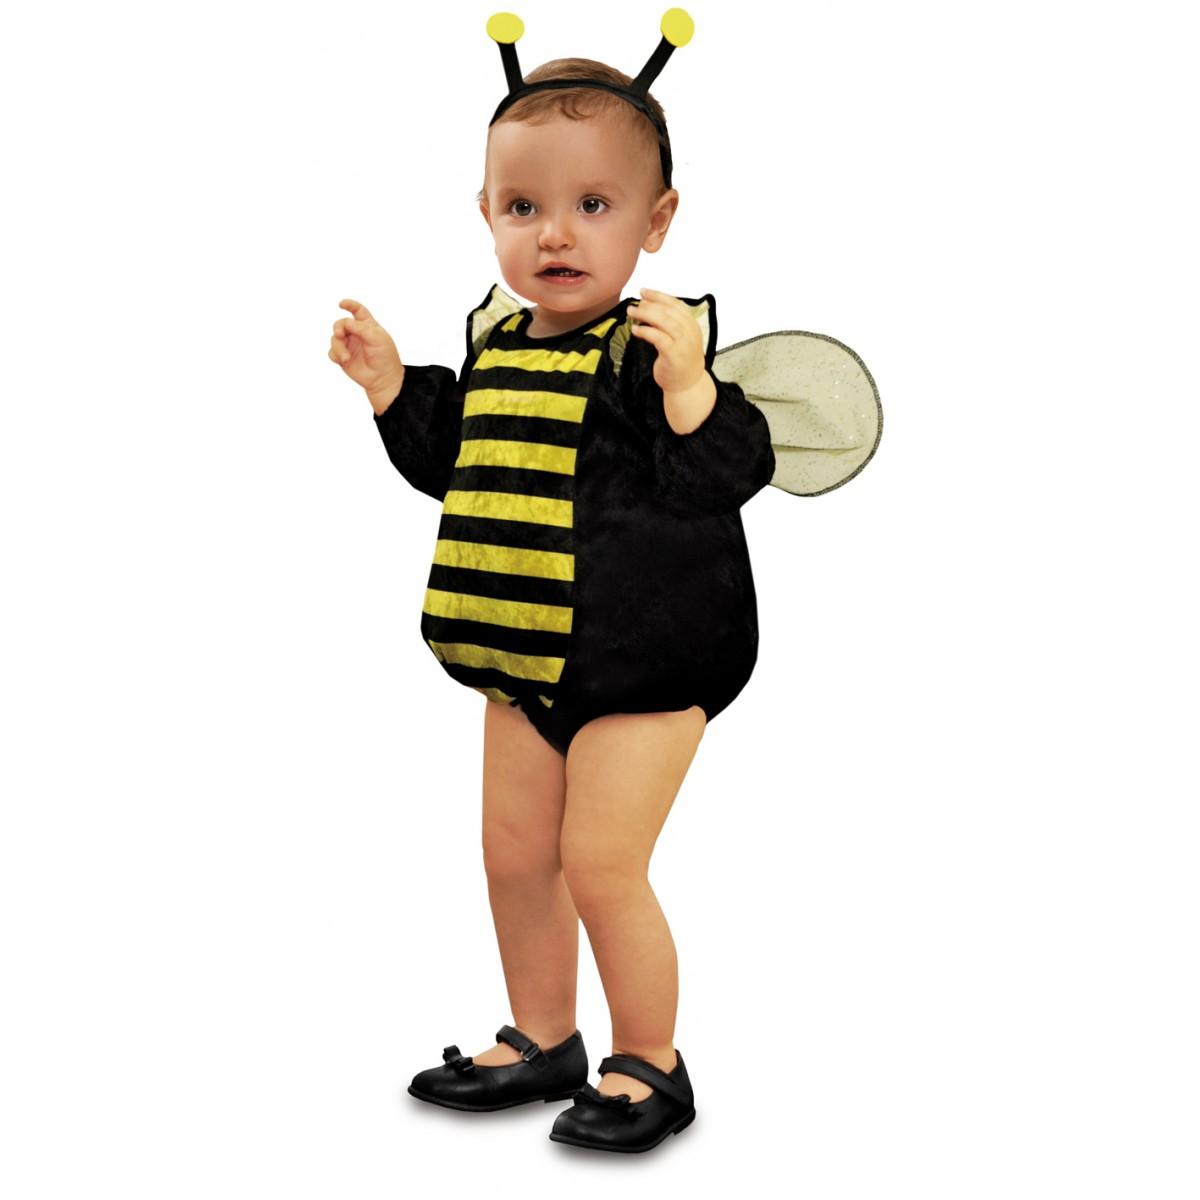 disfraz de abeja bebe - DISFRAZ DE ABEJITA BEBE